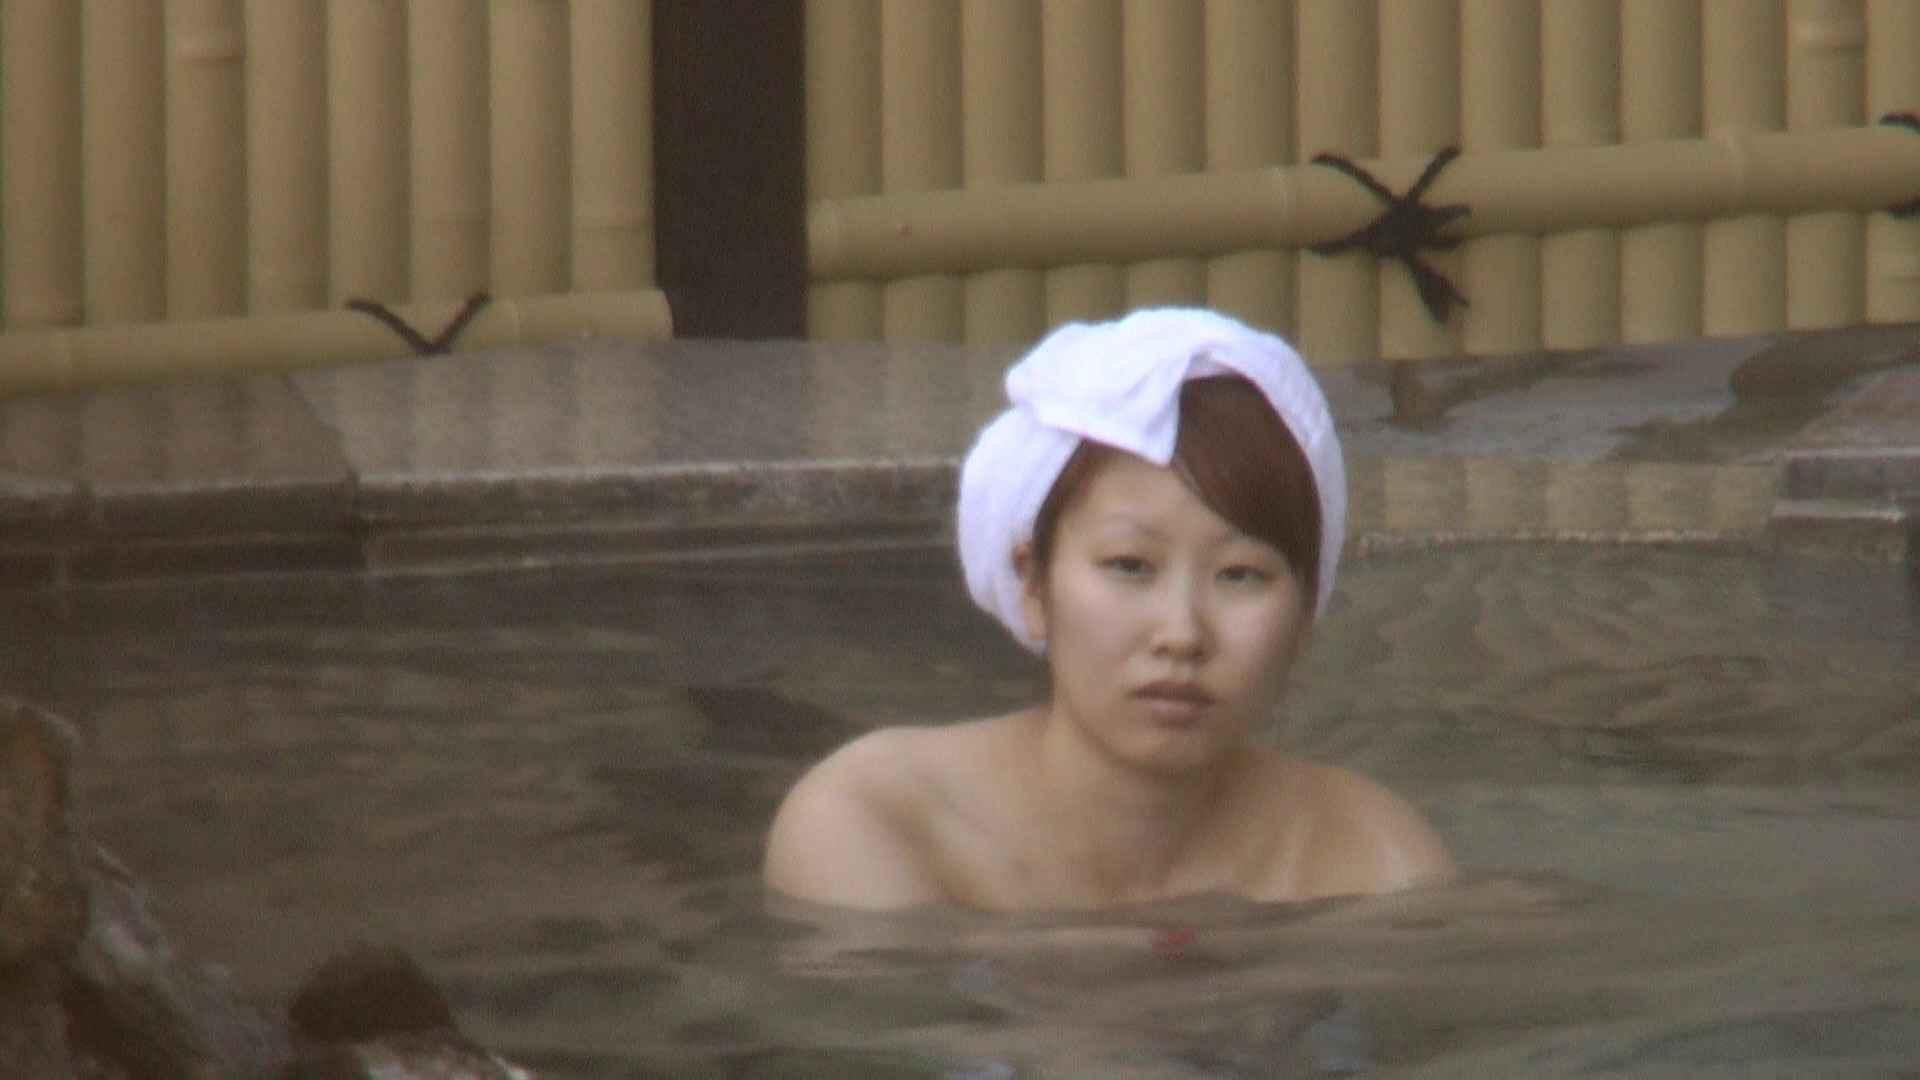 Aquaな露天風呂Vol.210 露天風呂編   盗撮シリーズ  86PIX 29